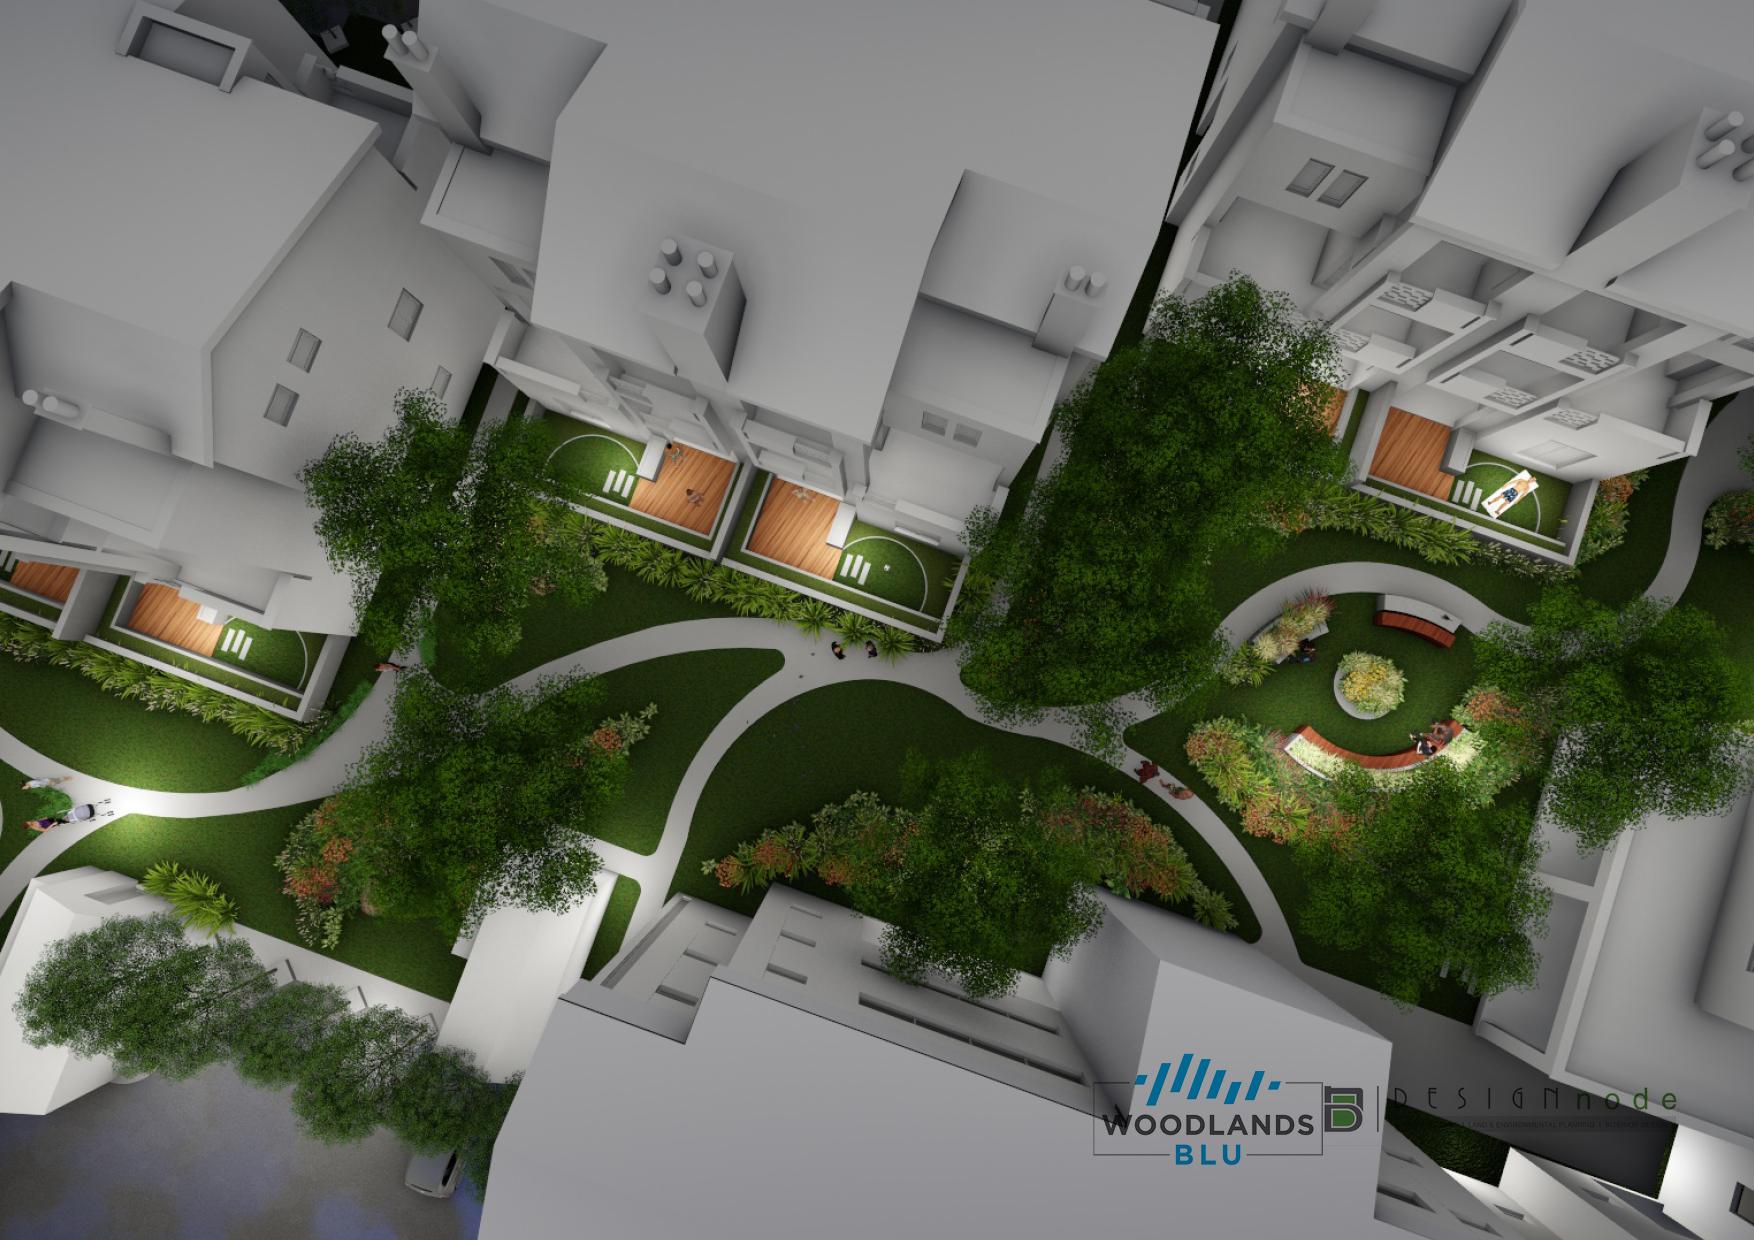 Woodlands Blu Estate, 160 units